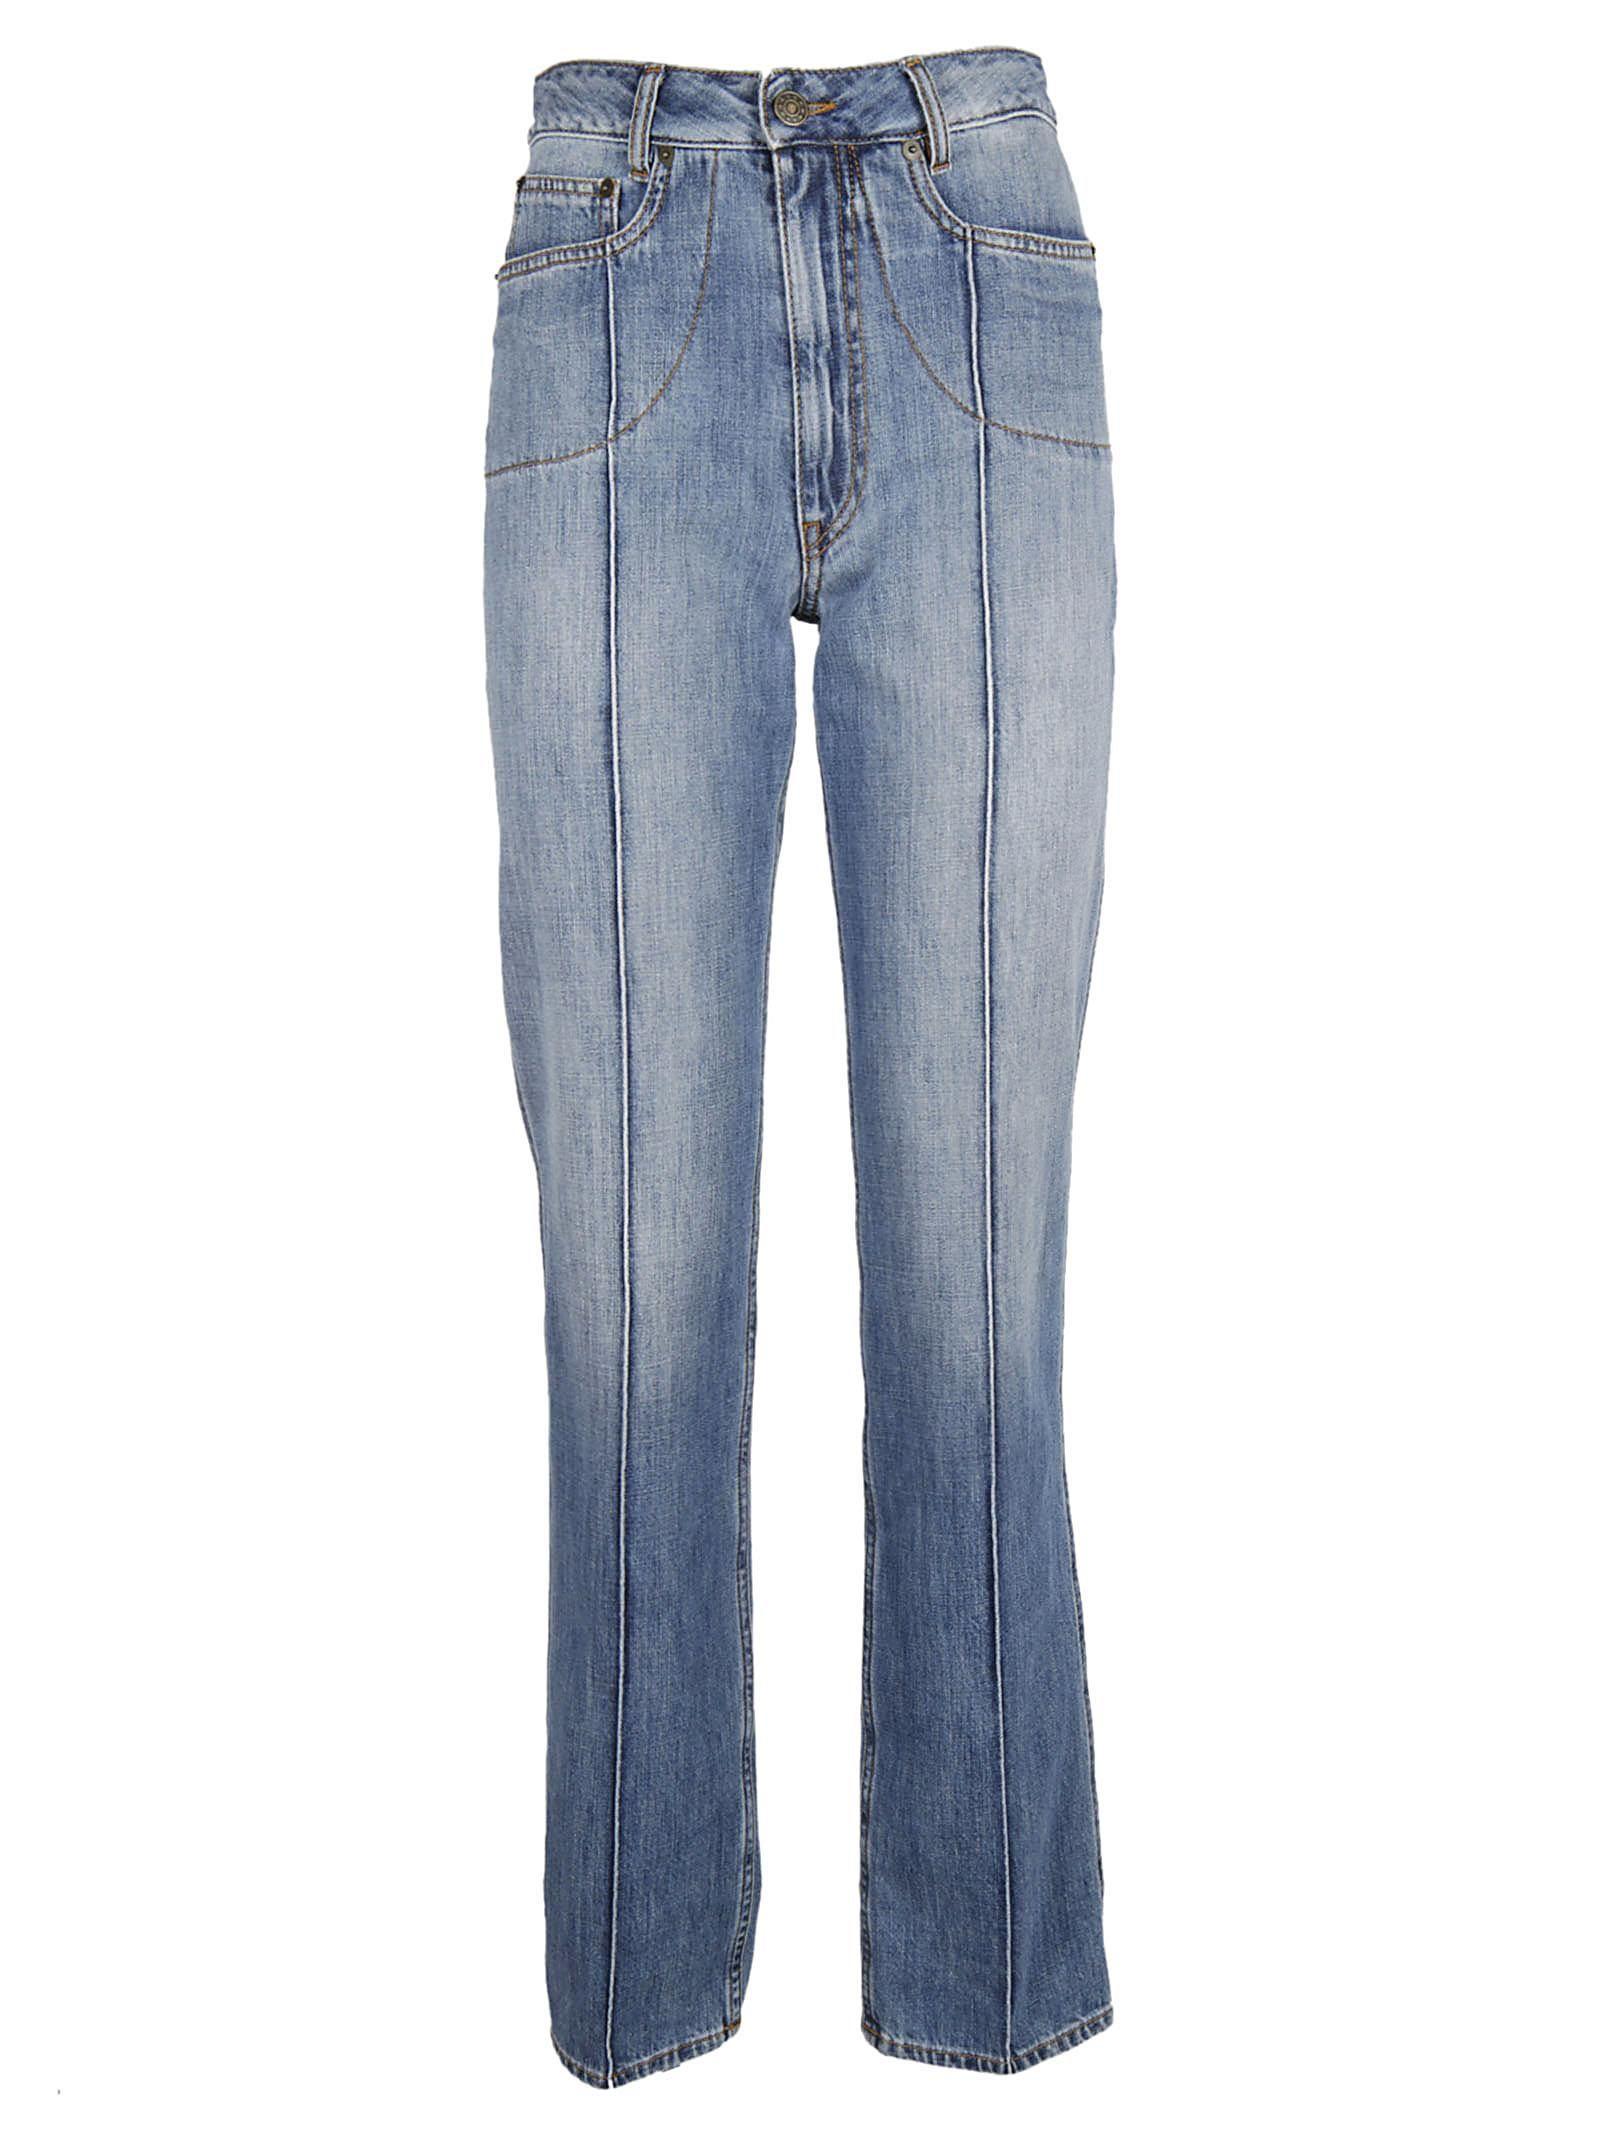 Maison Margiela Stripe Detail Jeans